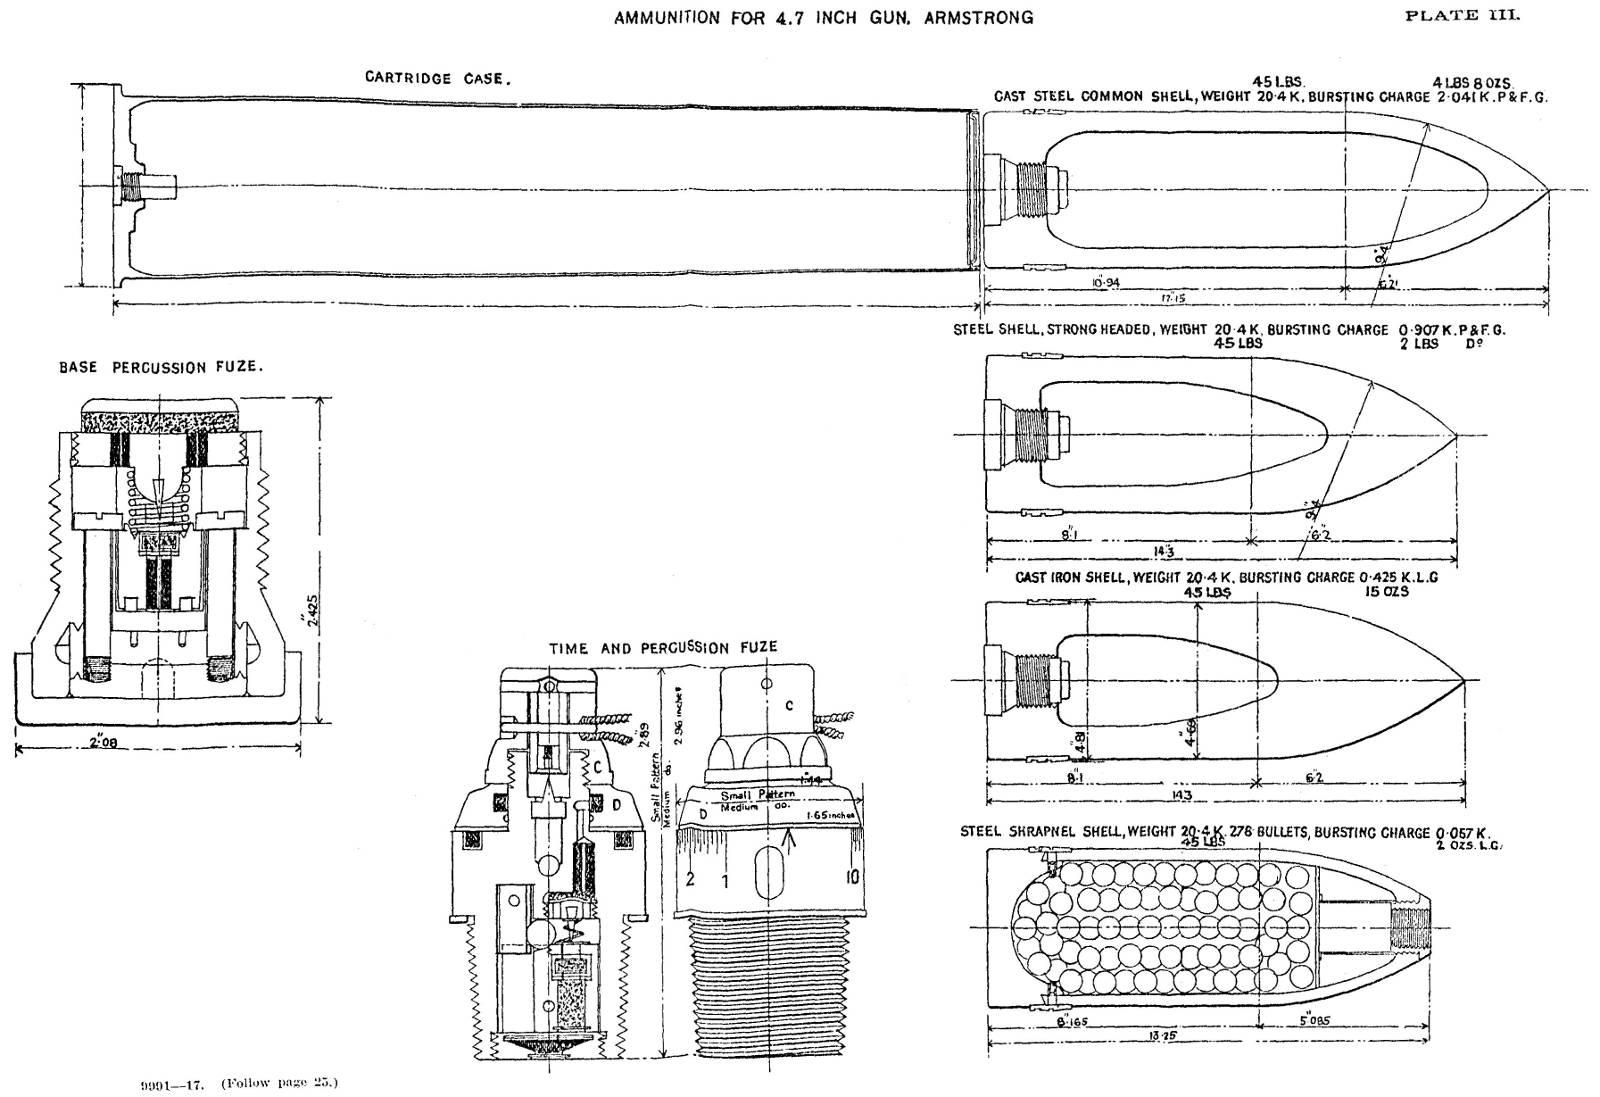 File Qf 4 7 Inch Gun Ammunition Diagrams Us Service